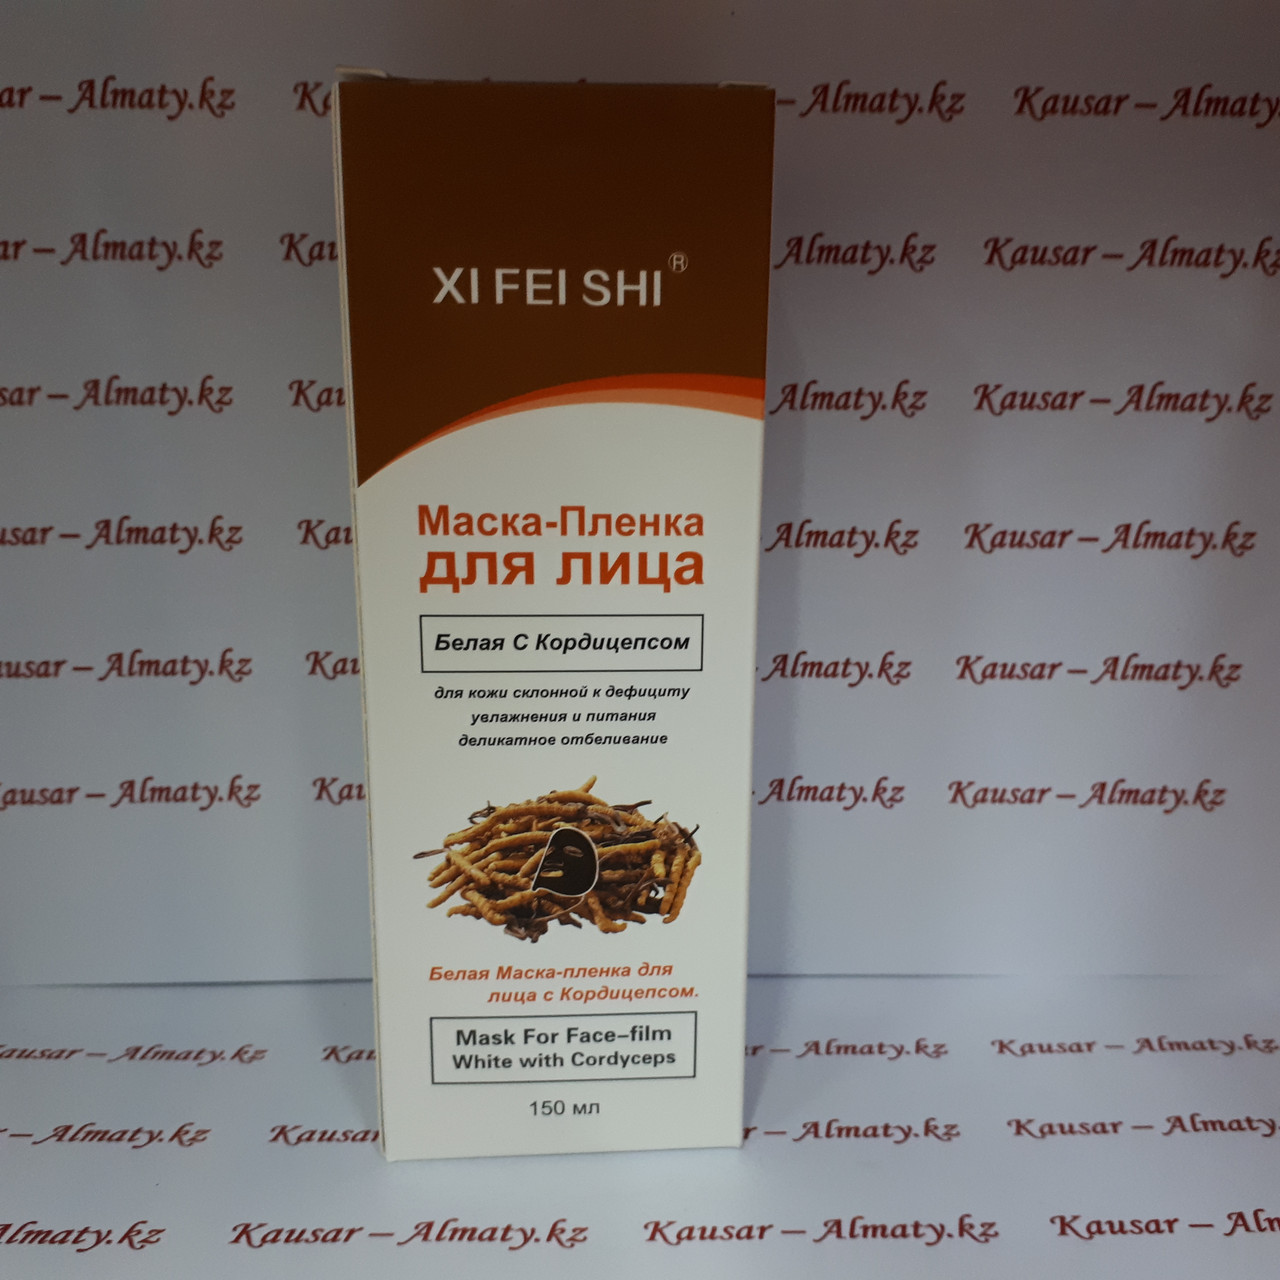 Маска-пленка для лица Xi Fei Shi, кордицепс